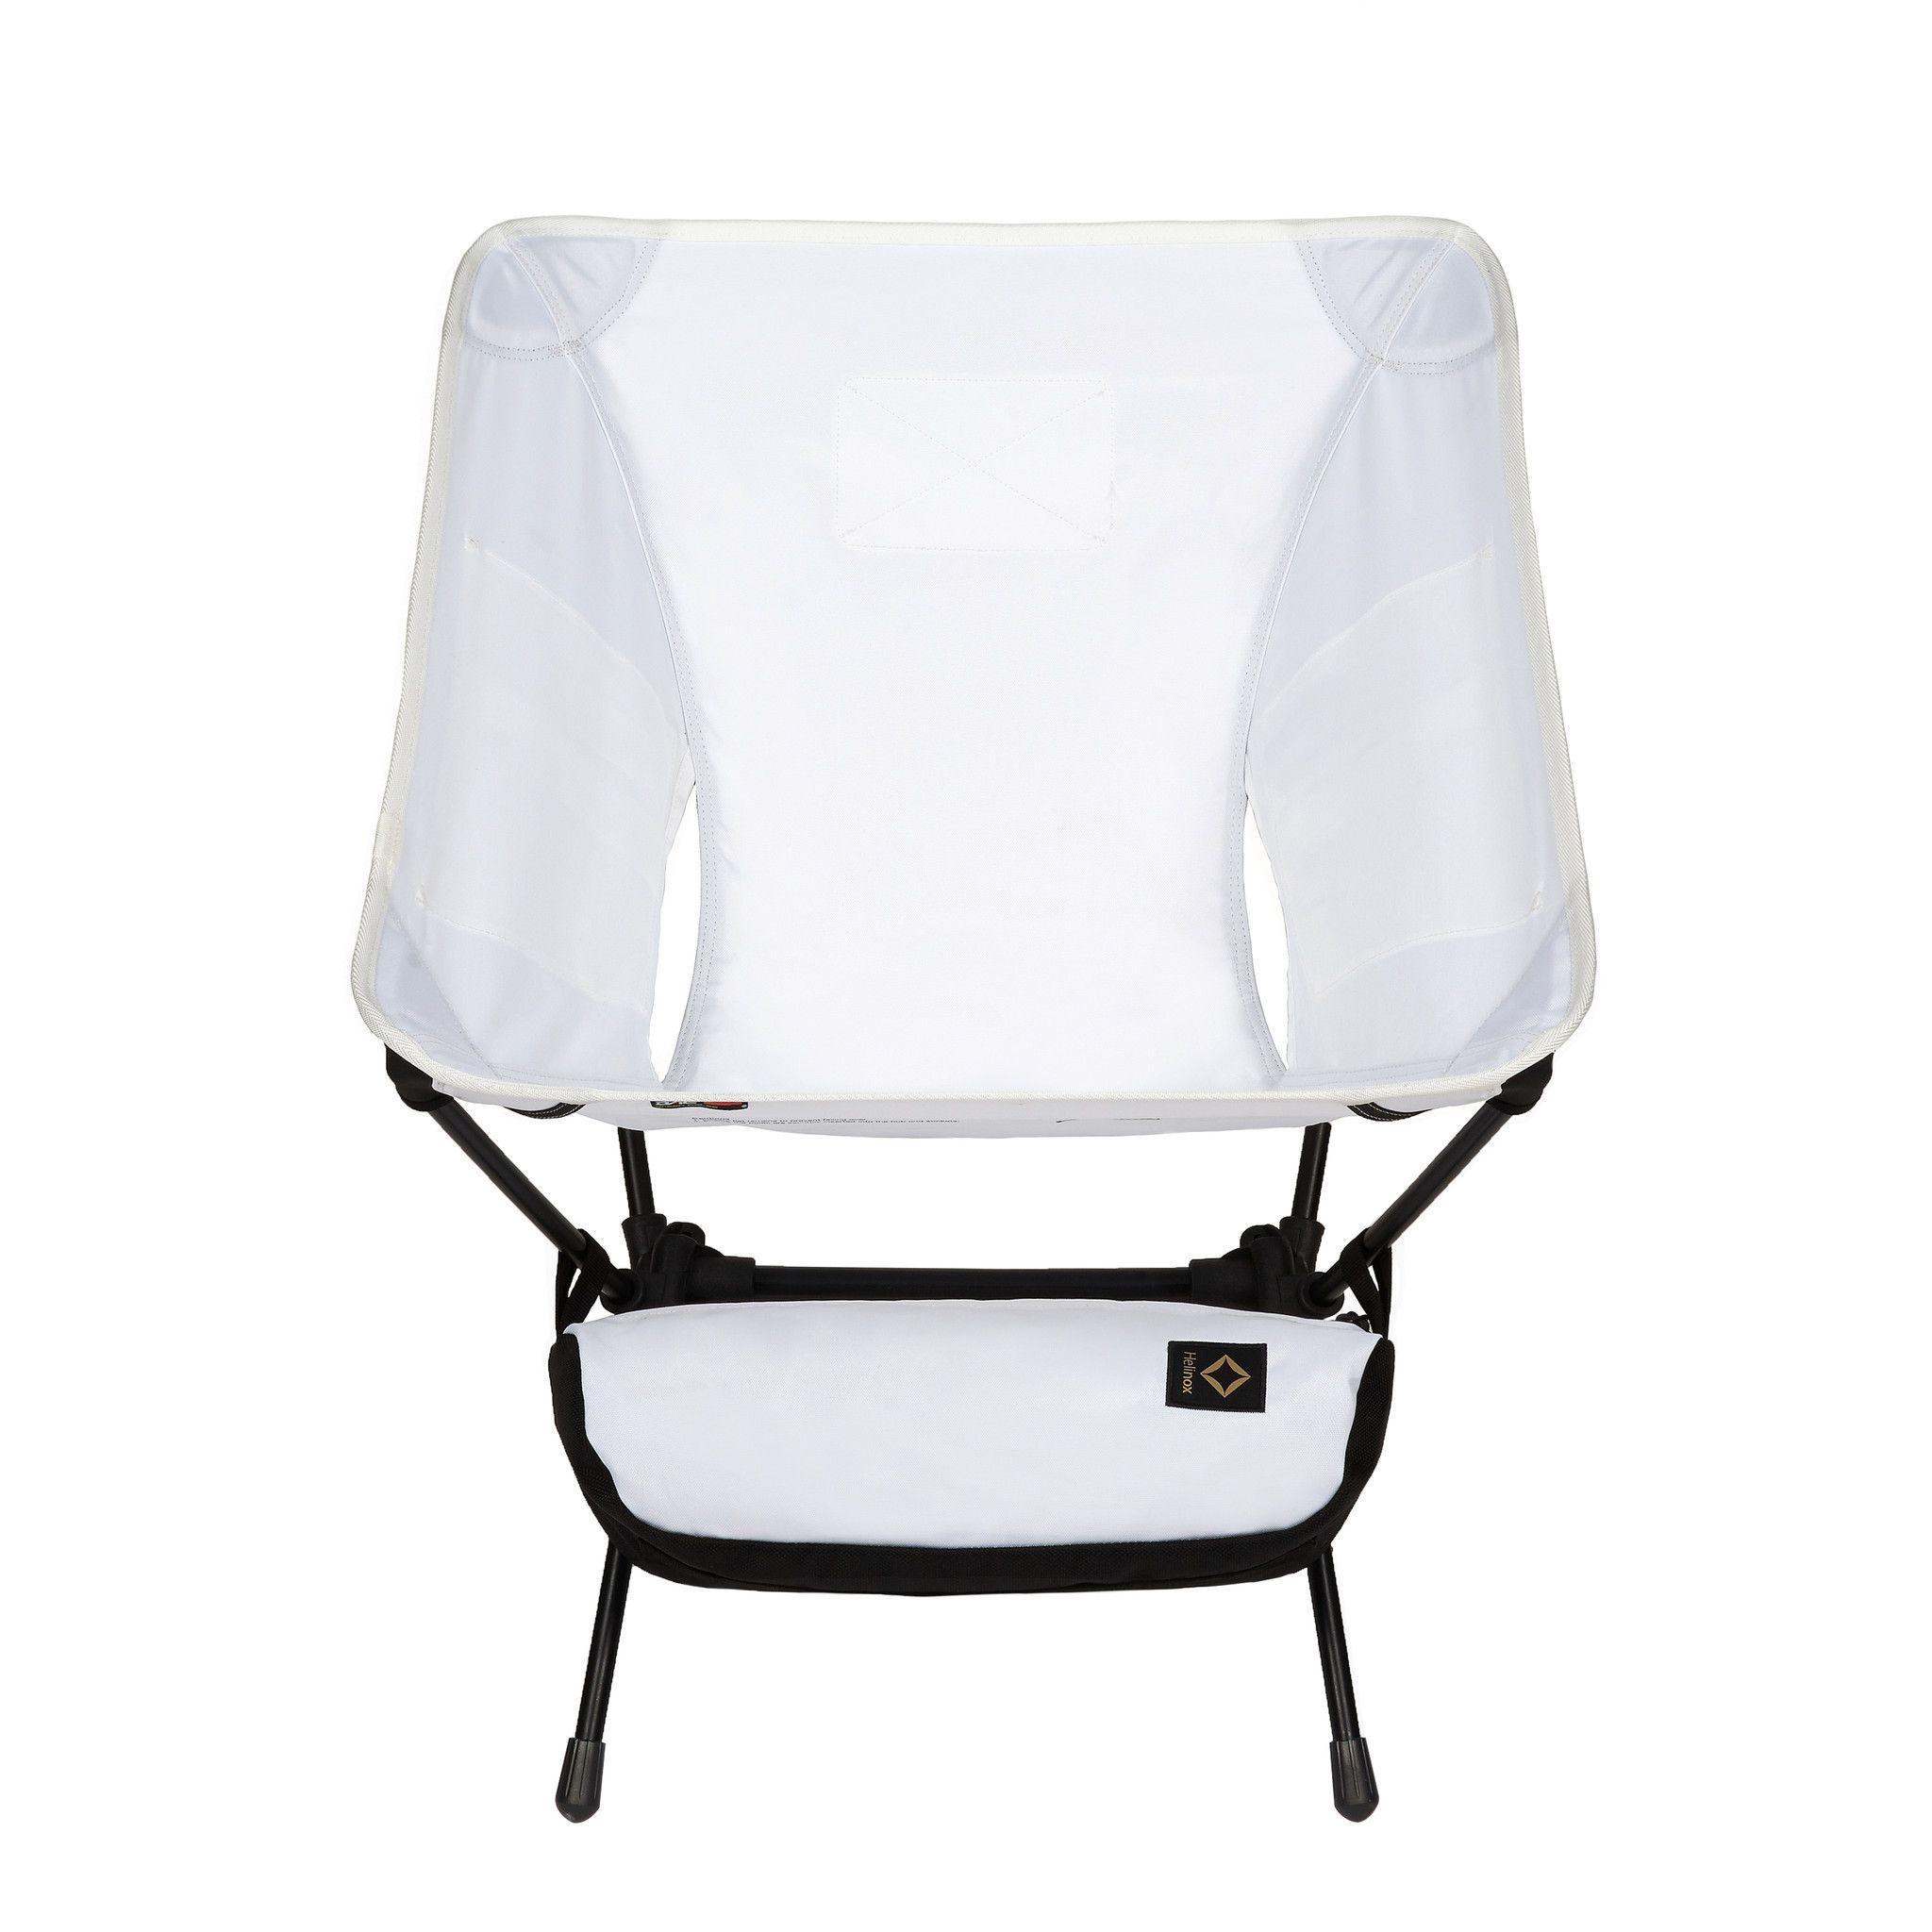 Super Helinox Chair Tactical Snow White Gear List Camping Machost Co Dining Chair Design Ideas Machostcouk